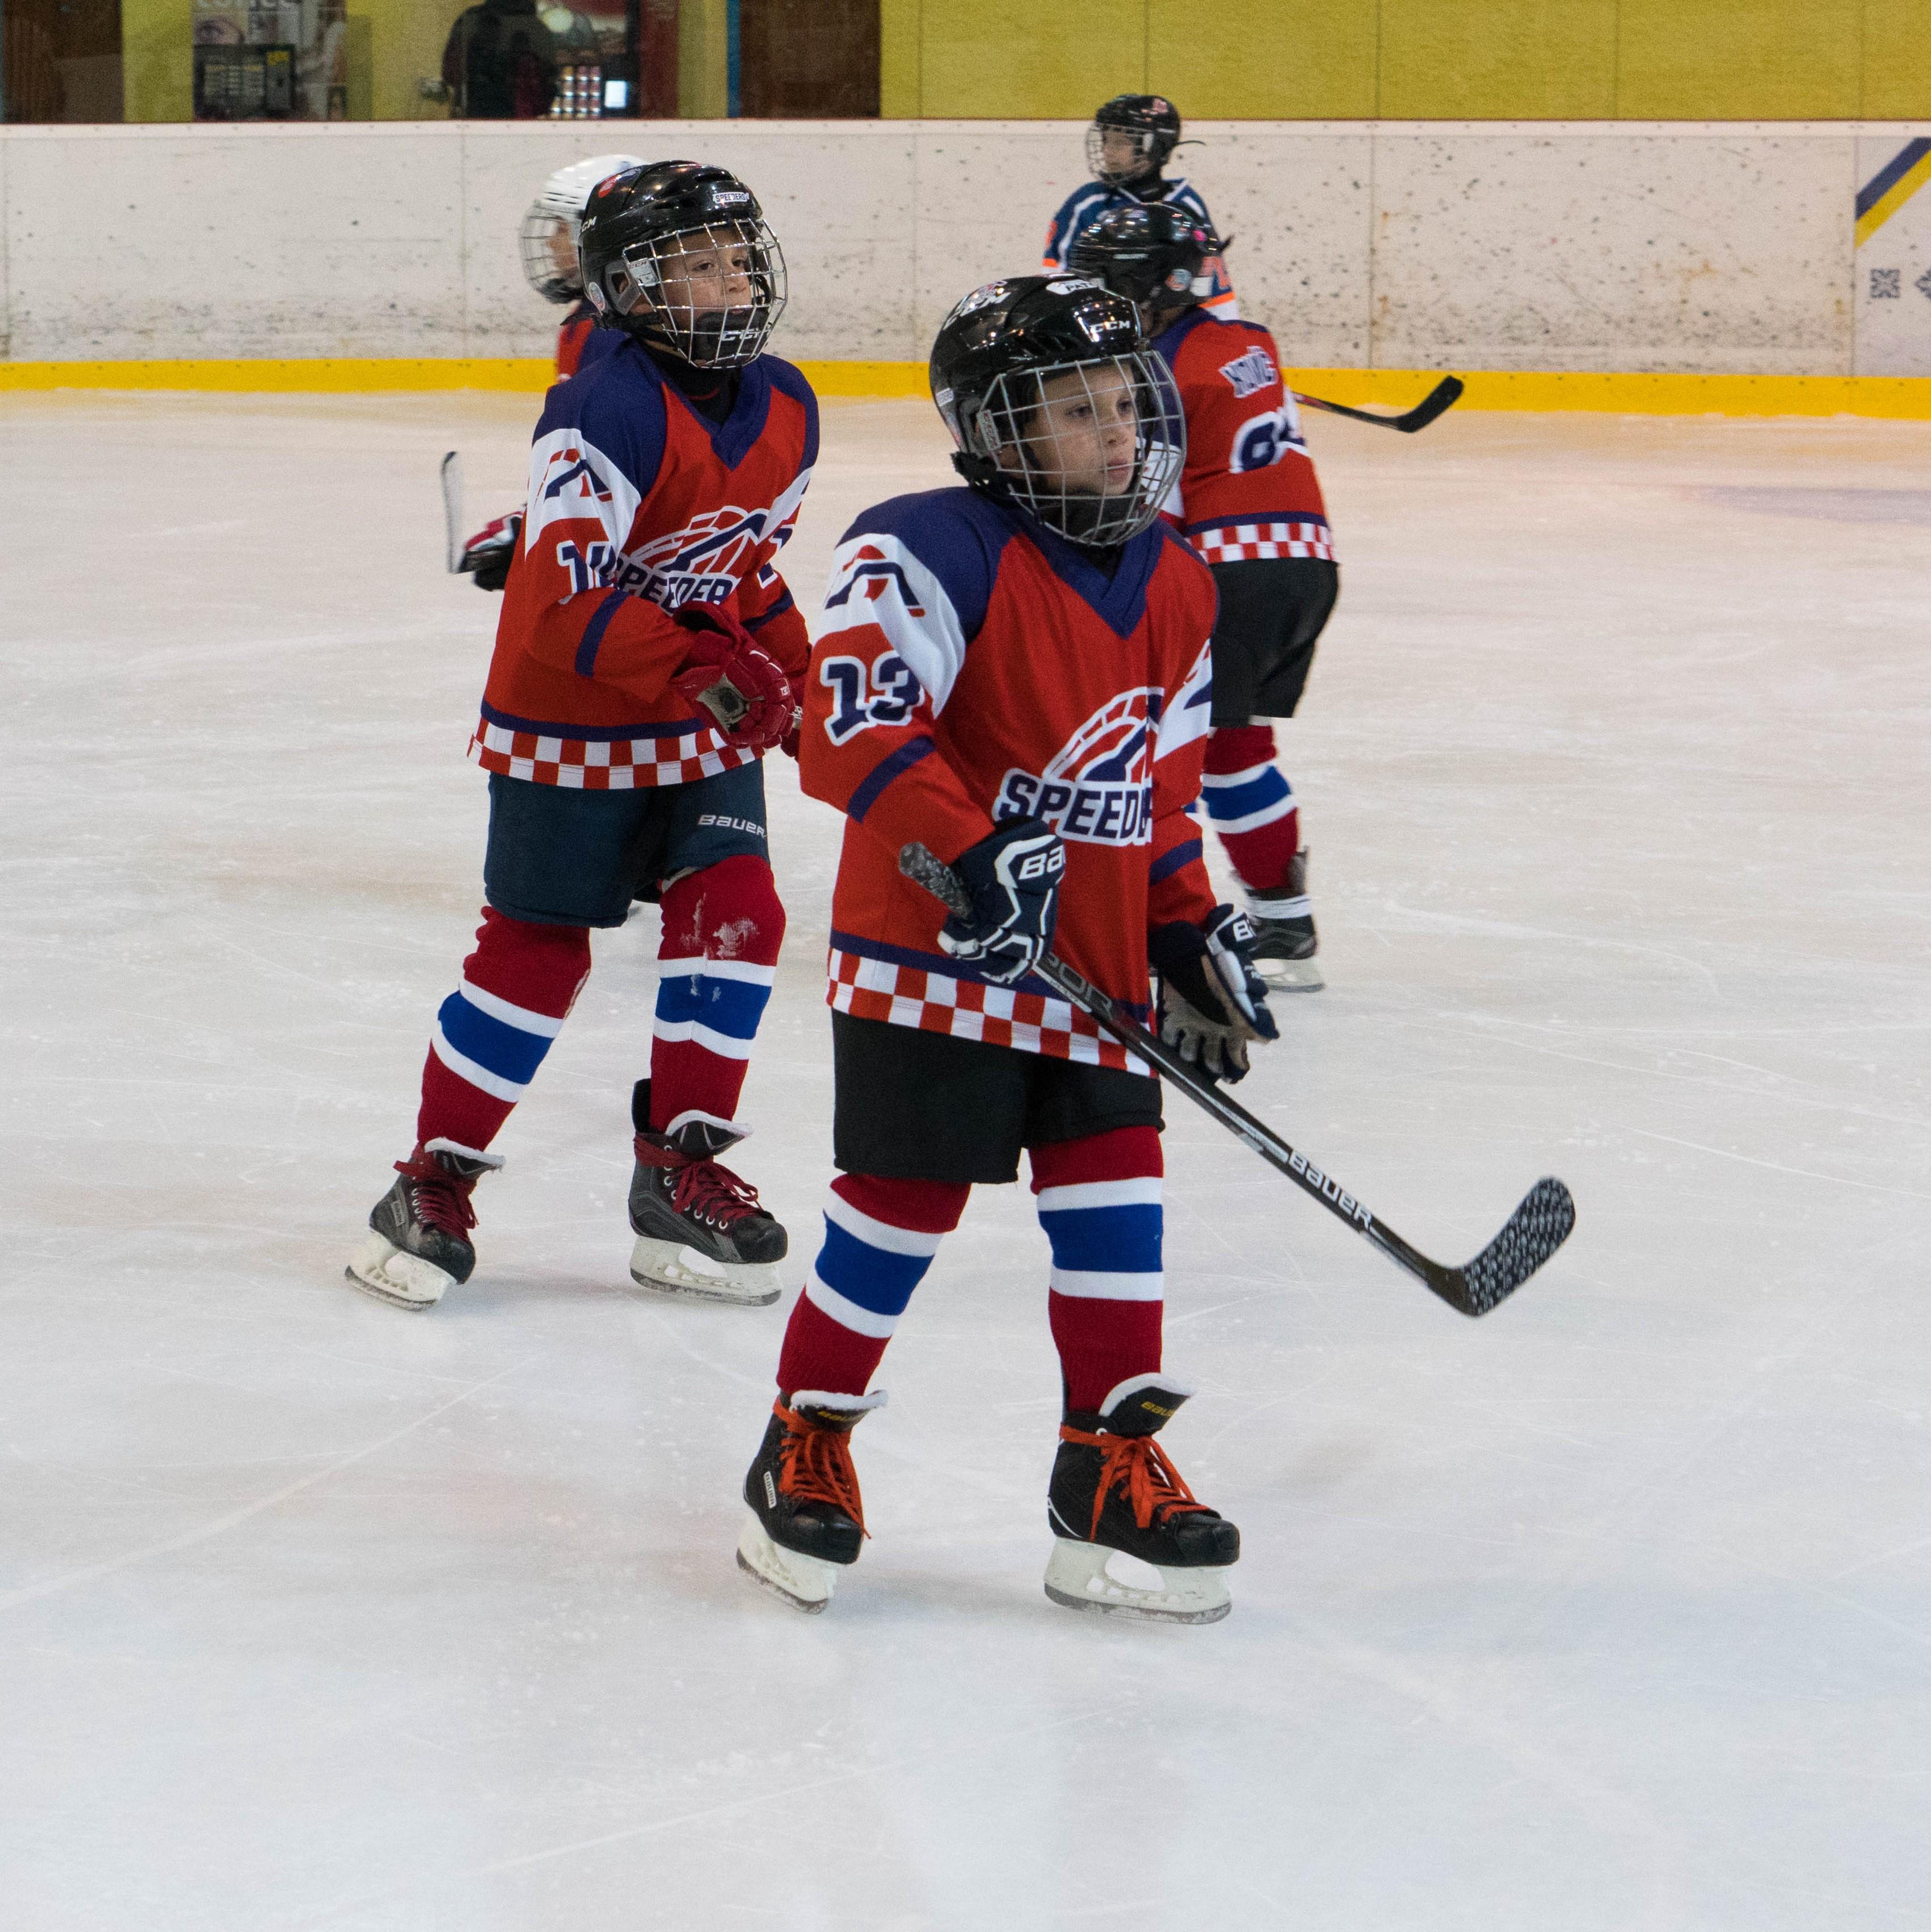 hokejovy turnaj Puchov 2.miesto speeders bratislava 2